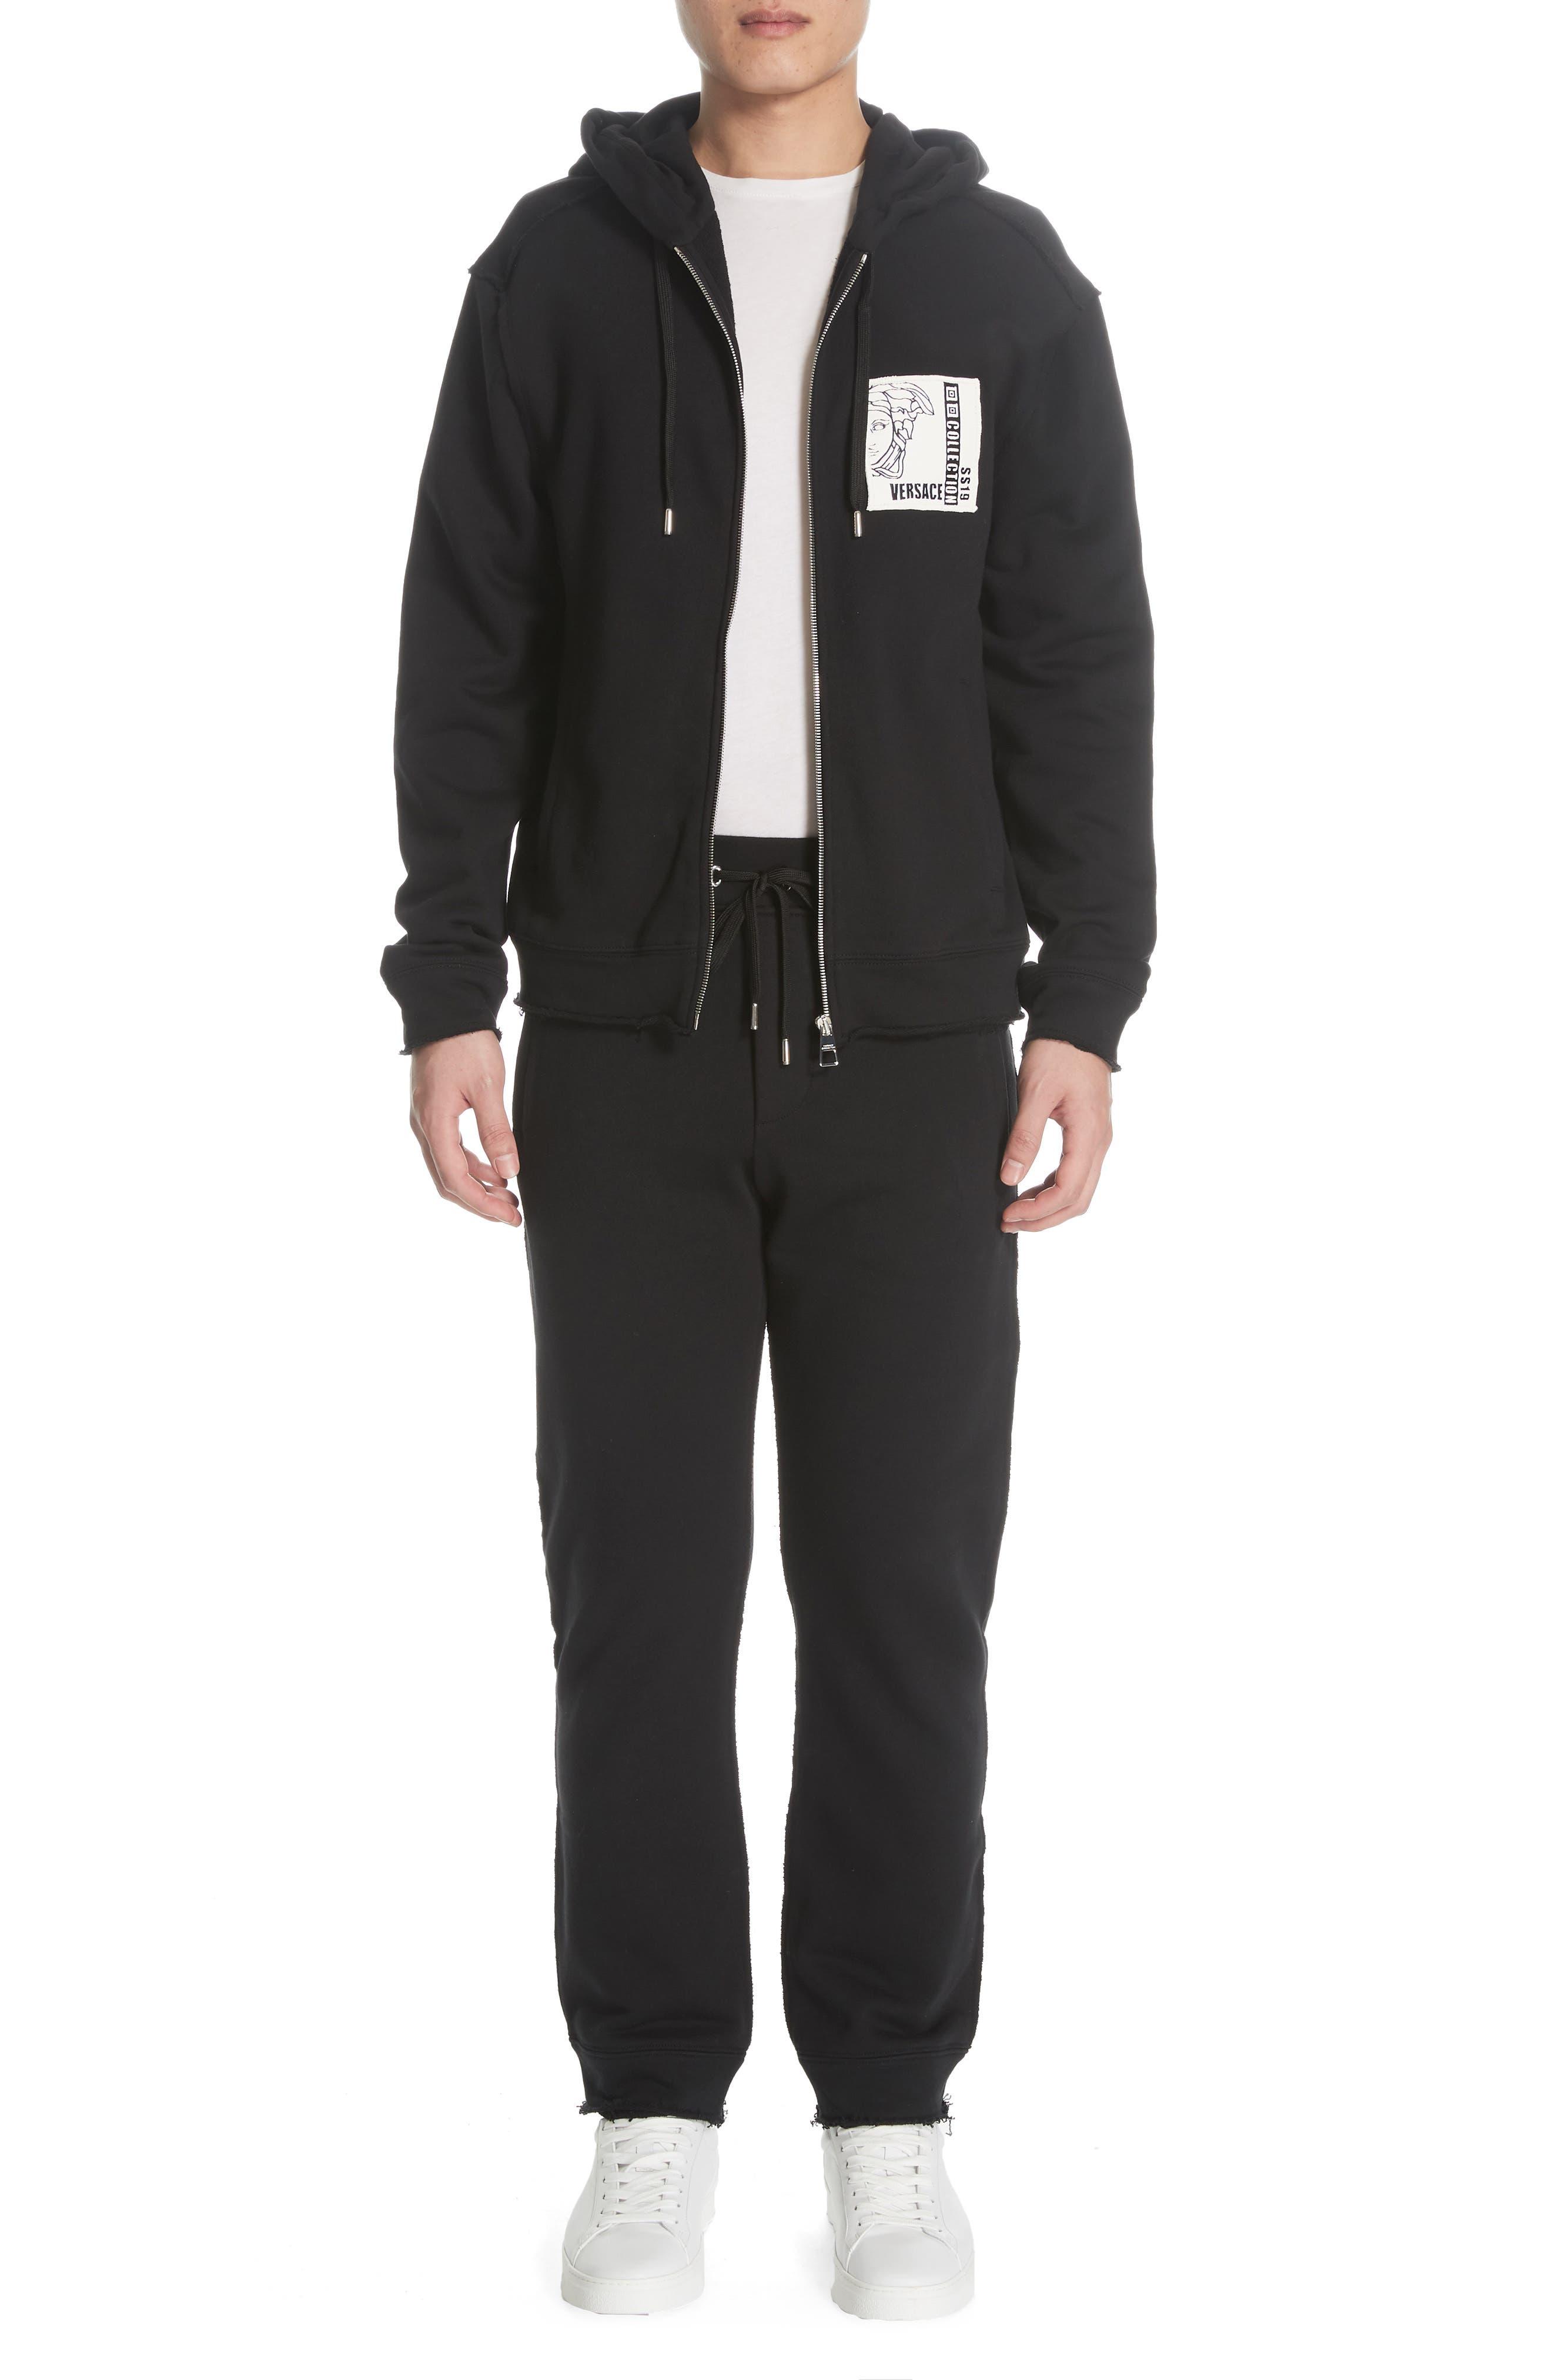 VERSACE COLLECTION, Zip Hoodie & Track Pants Set, Main thumbnail 1, color, BLACK